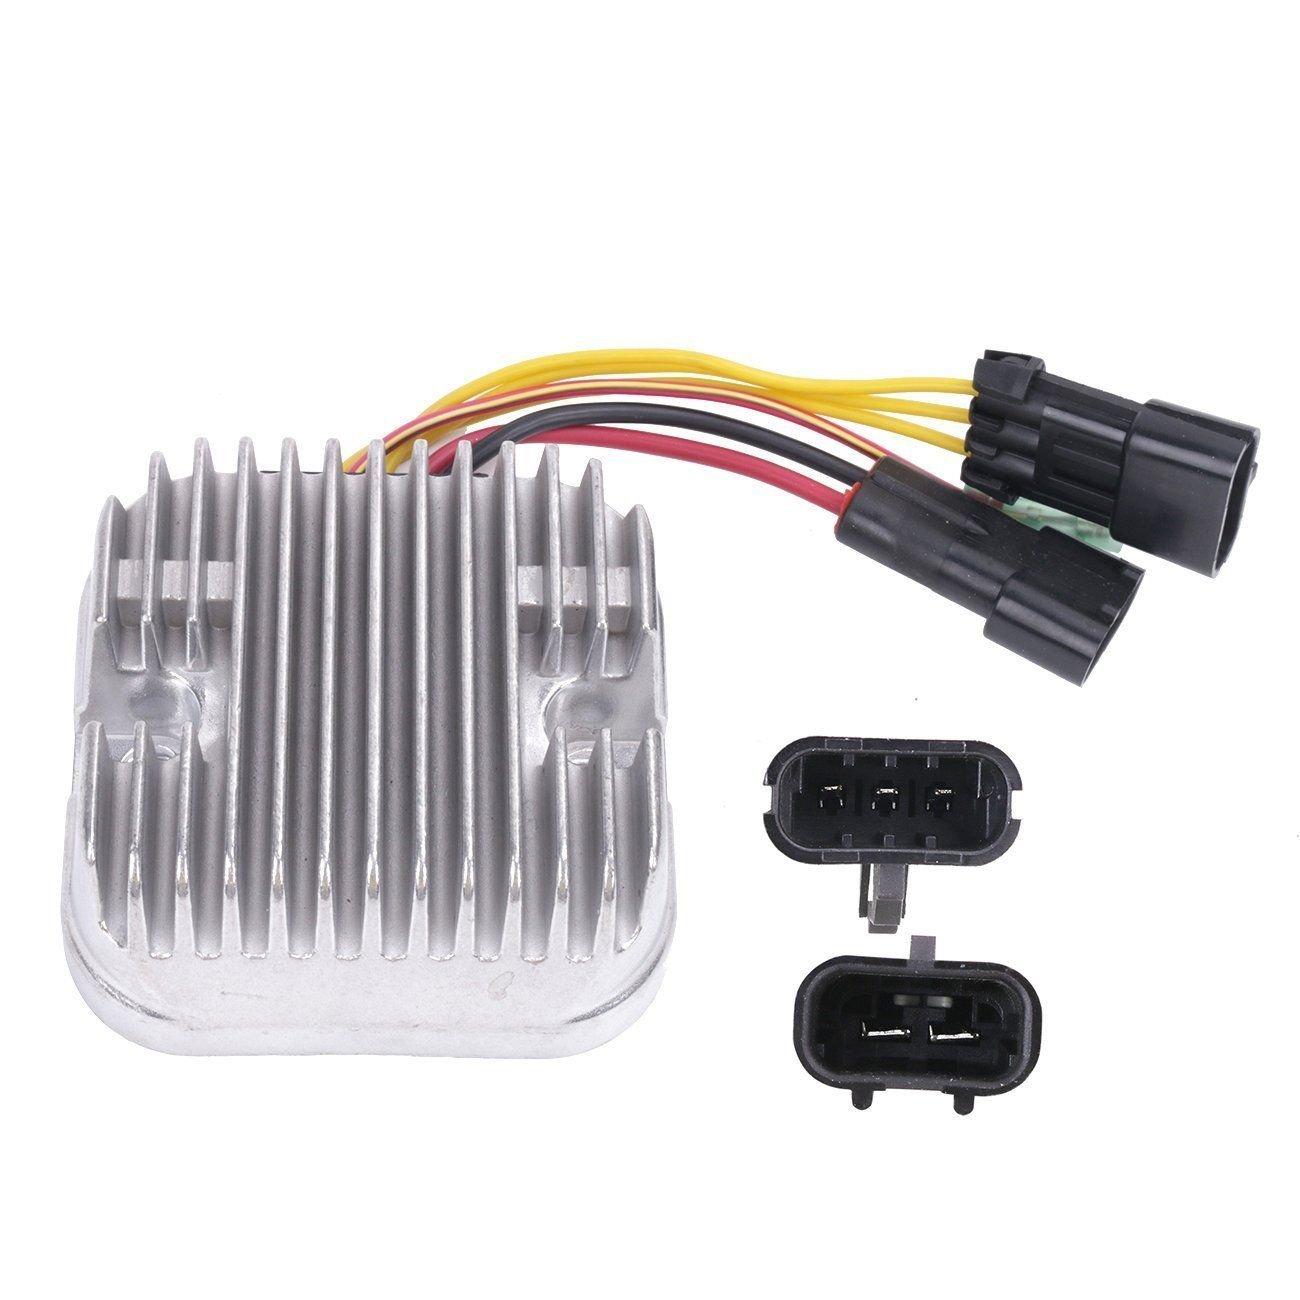 Cheap Polaris Sportsman 500 Magneto Find 800 Atv Wiring Get Quotations Li Bai Voltage Regulator Rectifier 4012384 For Ranger 700 Rzr